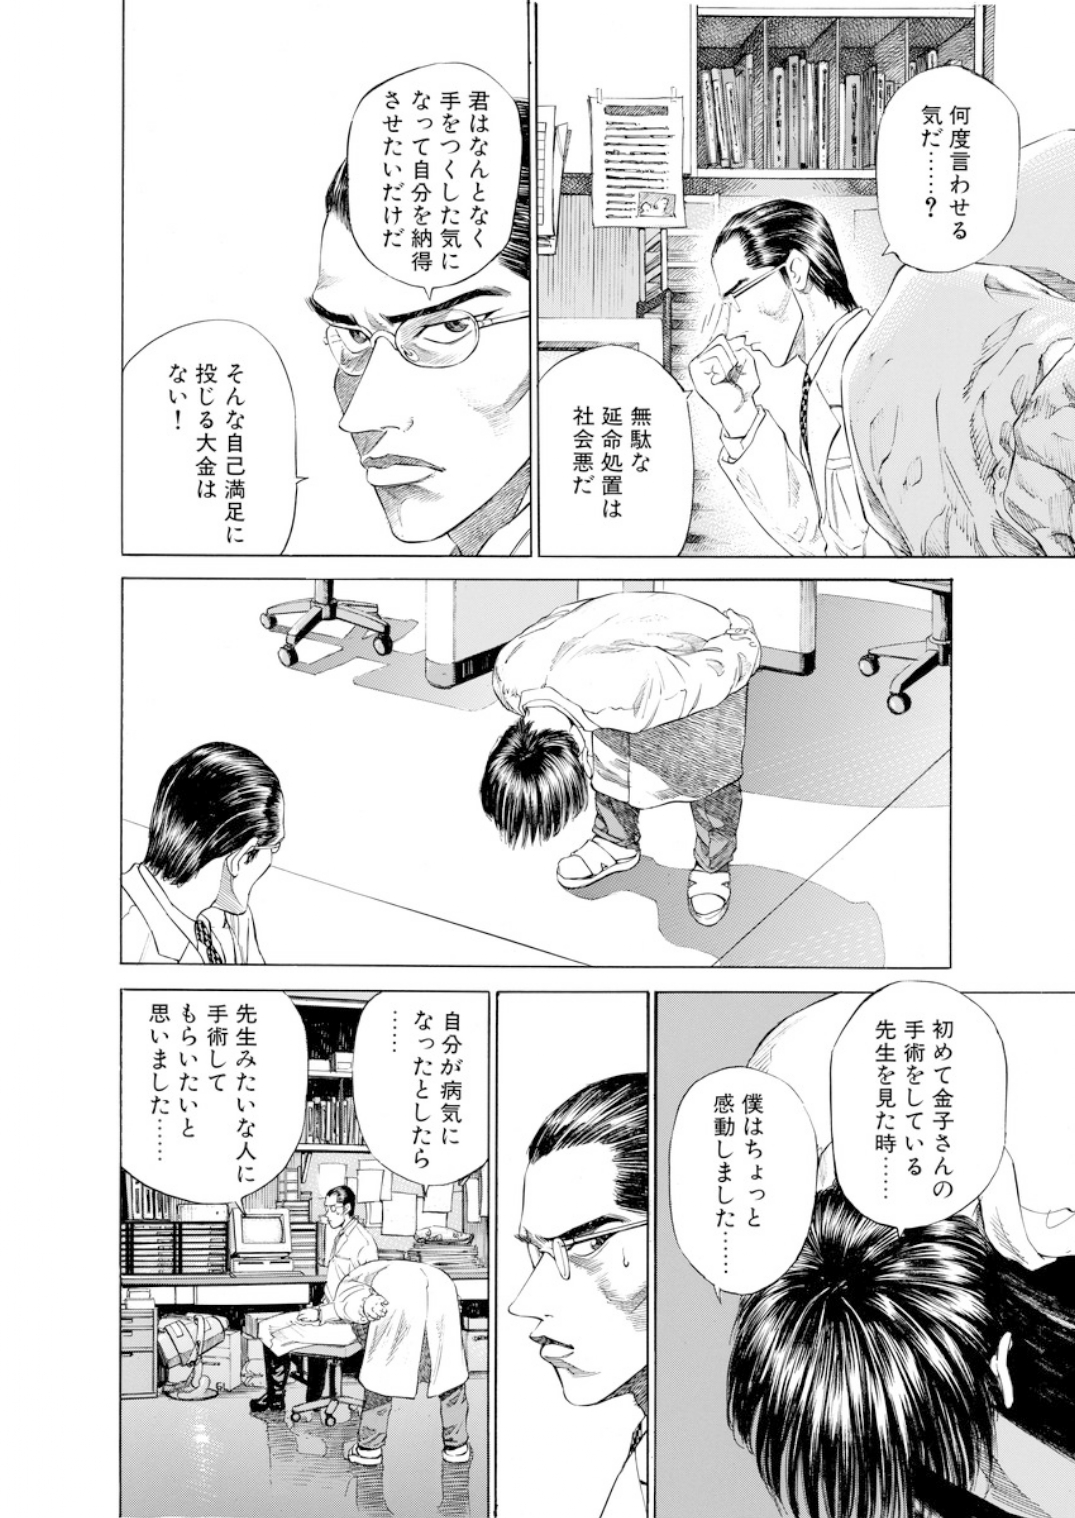 001bj_page-0126.jpg